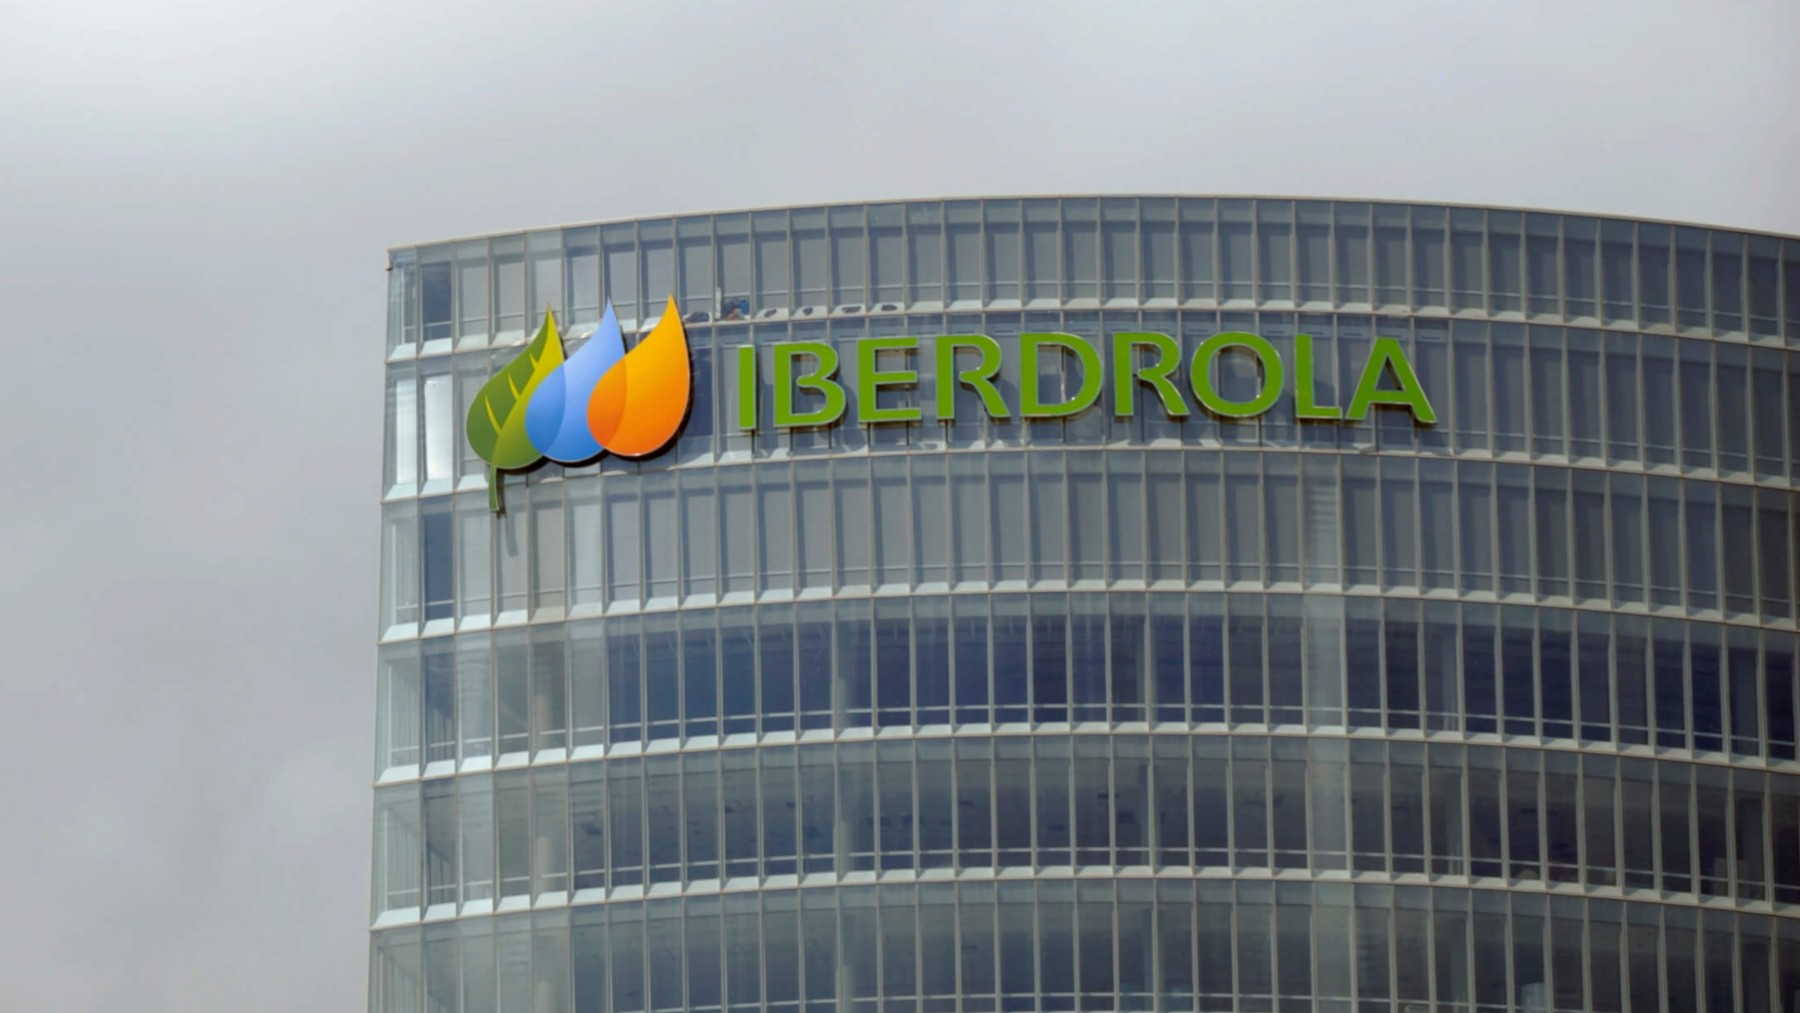 Torre de Iberdrola.